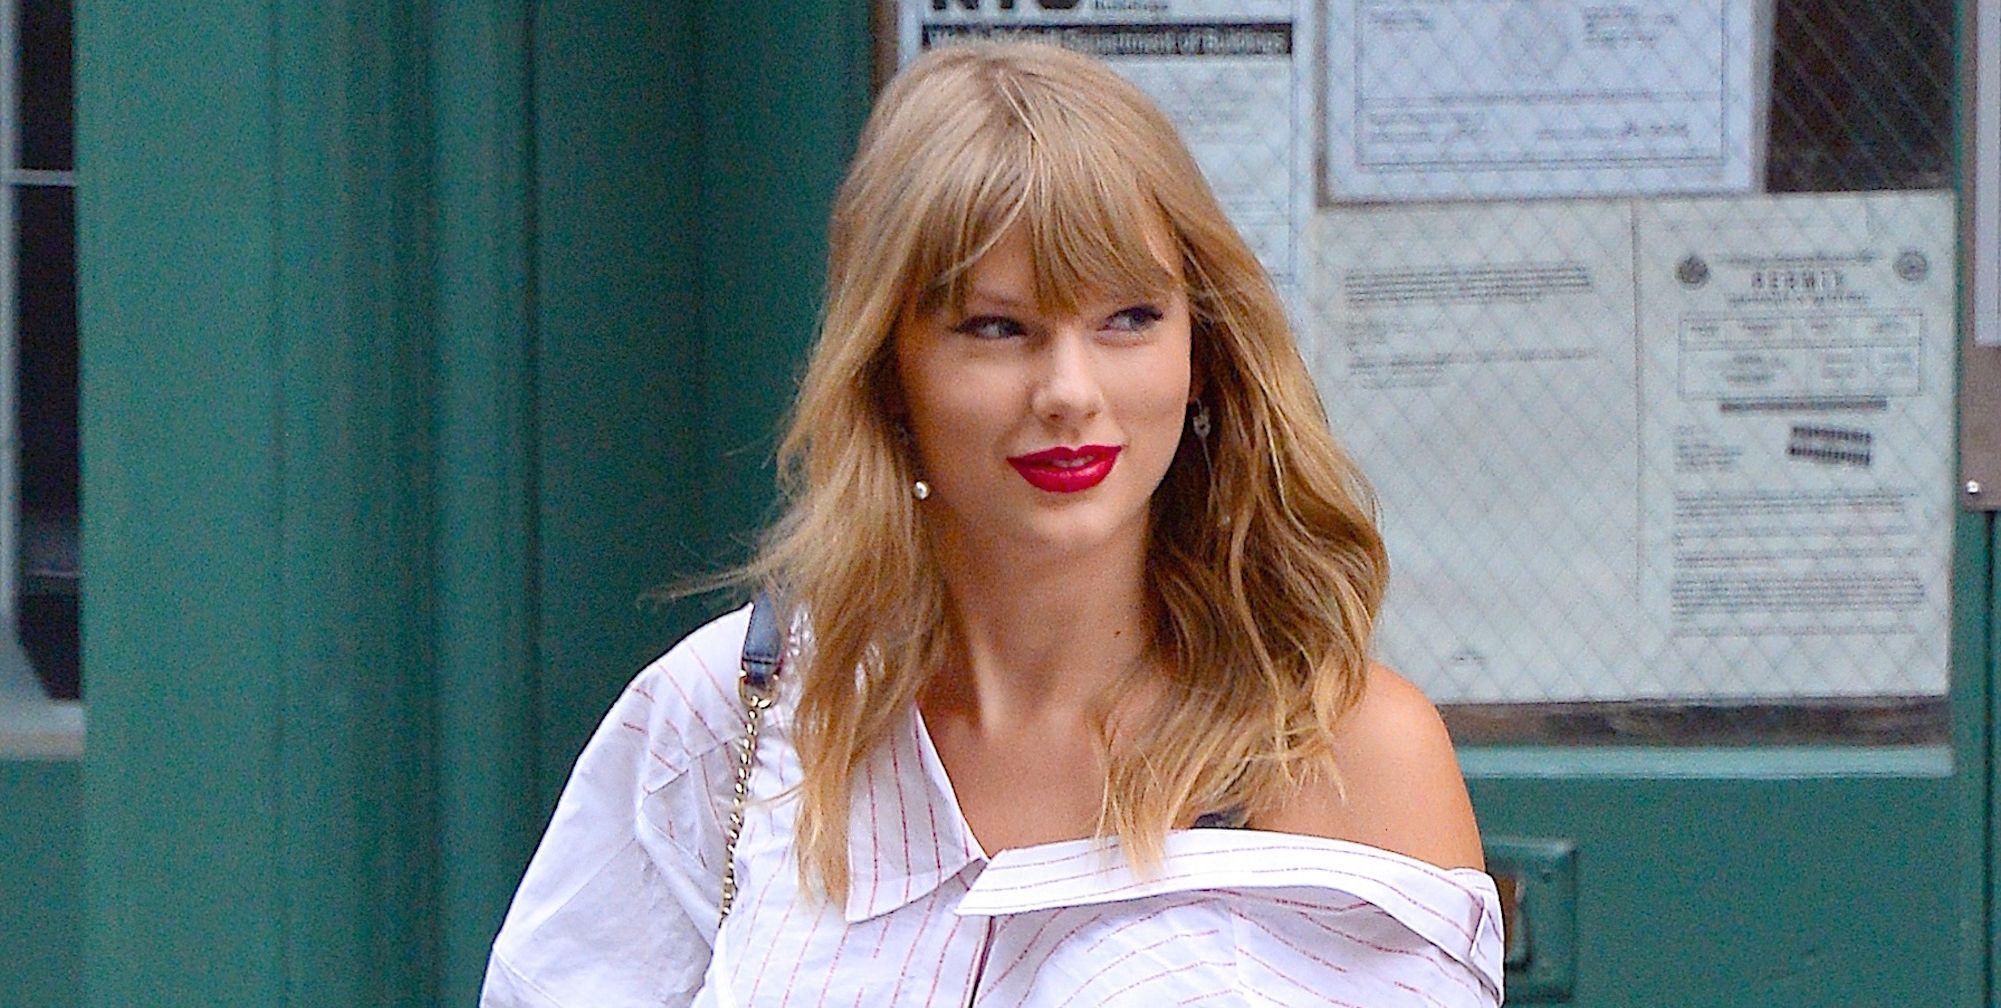 Celebrity Sightings in New York City - July 22, 2018